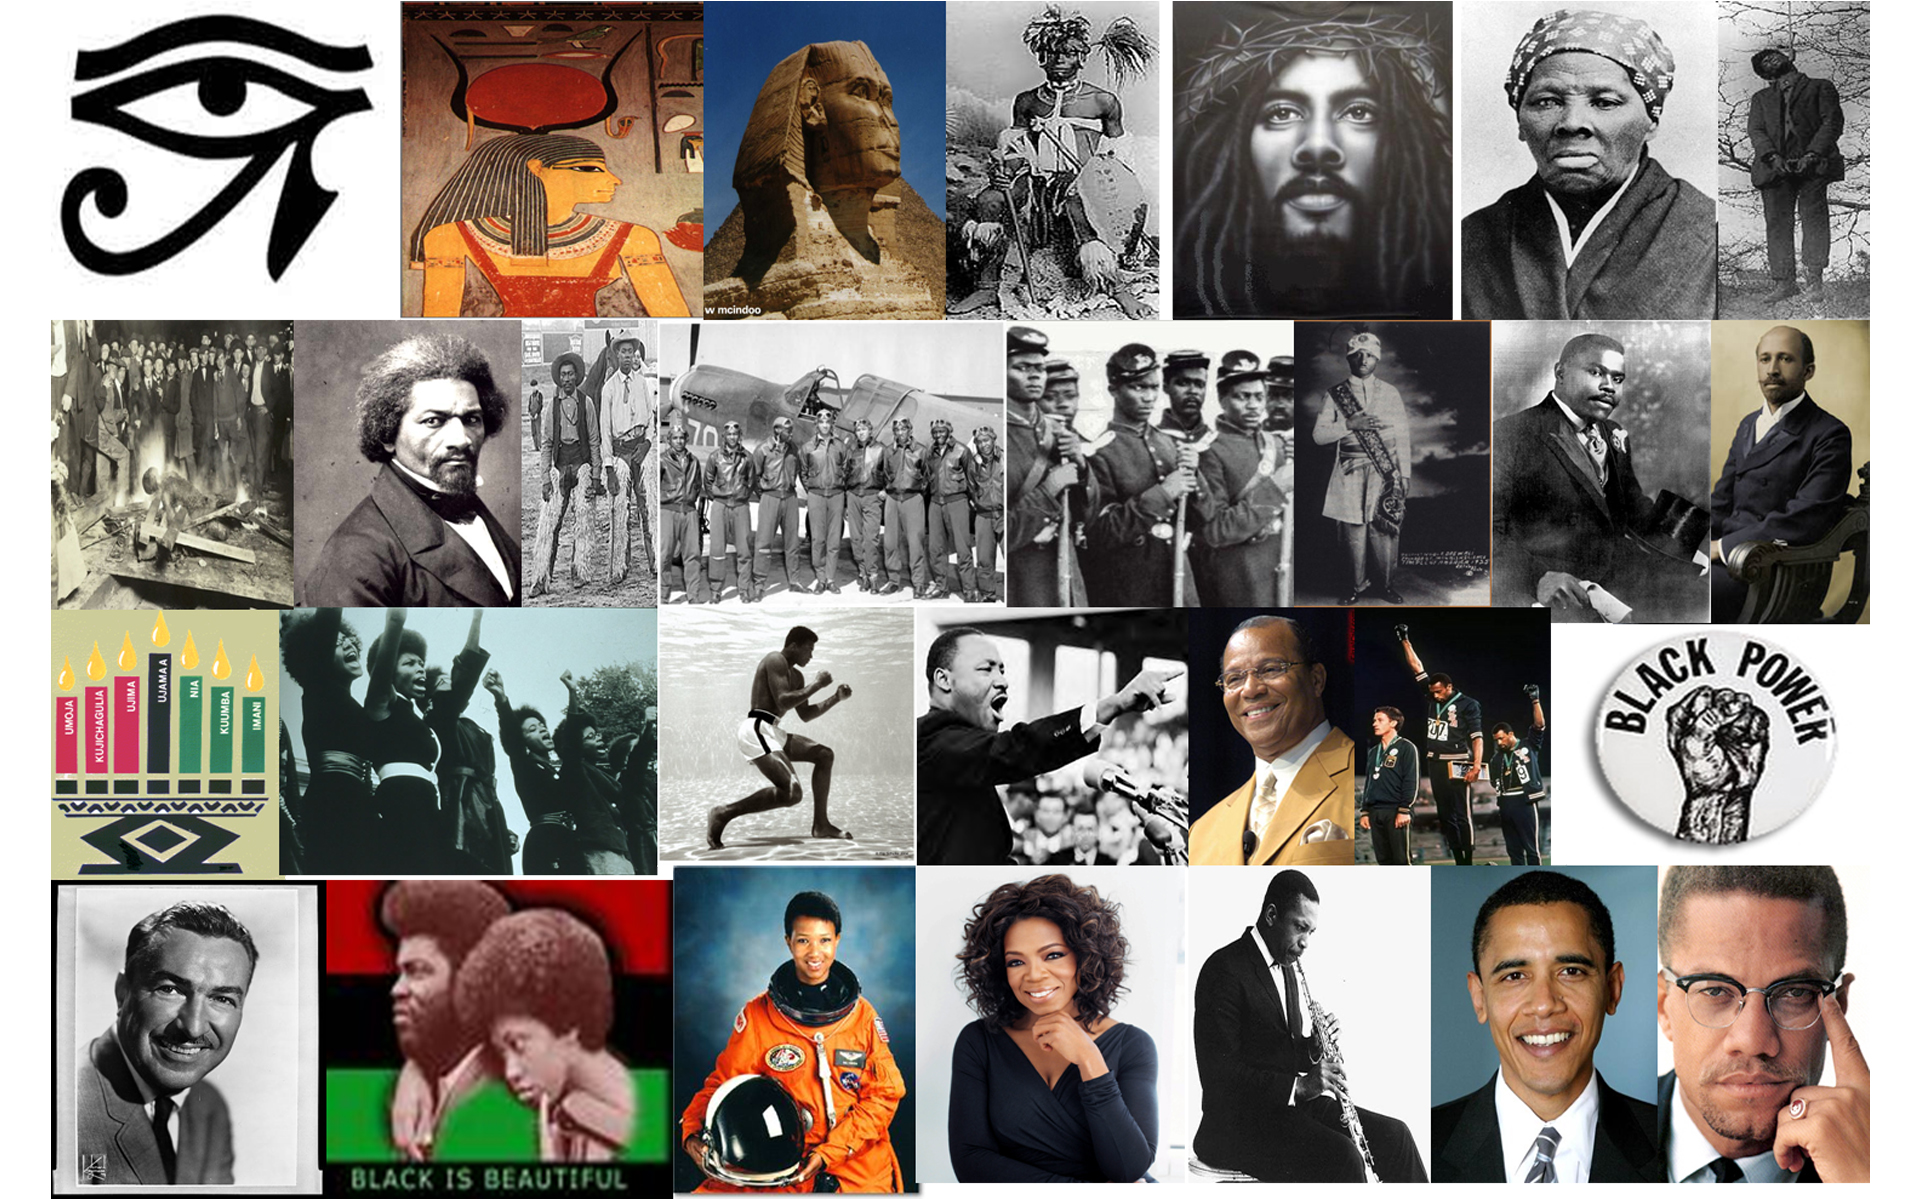 black history wallpaper - photo #14